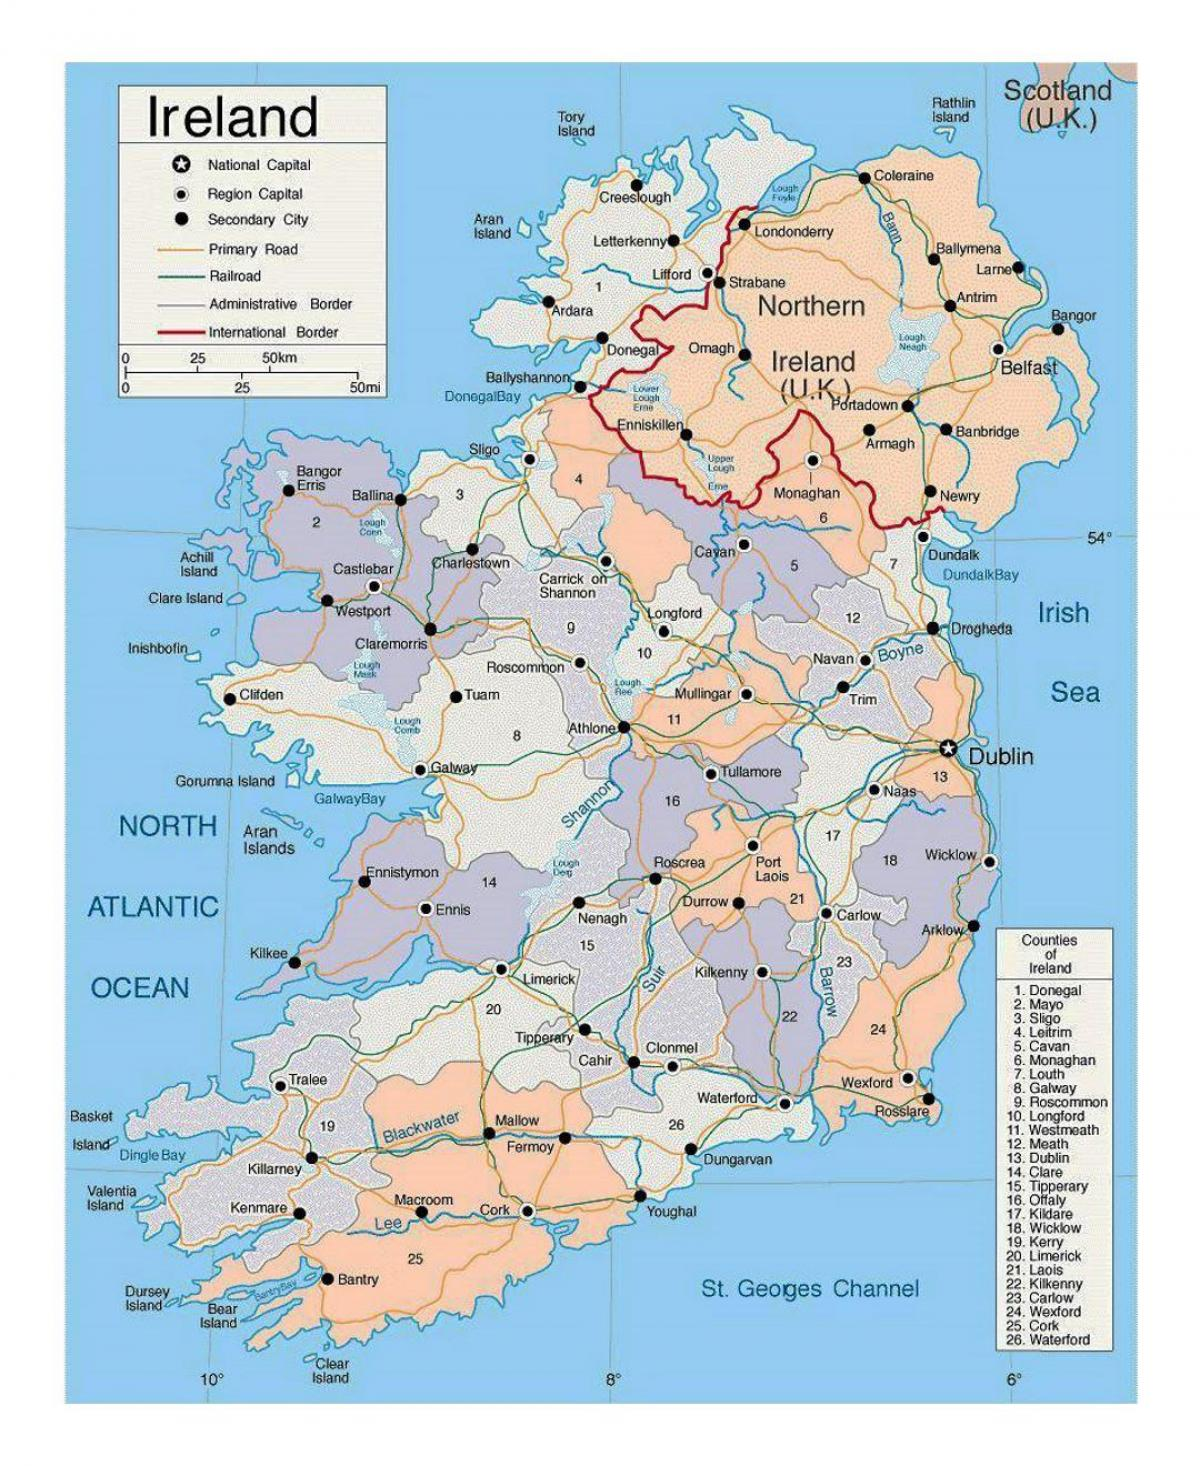 kart over irland Irland byer kart   Kart over irland med byer (Northern Europe  kart over irland